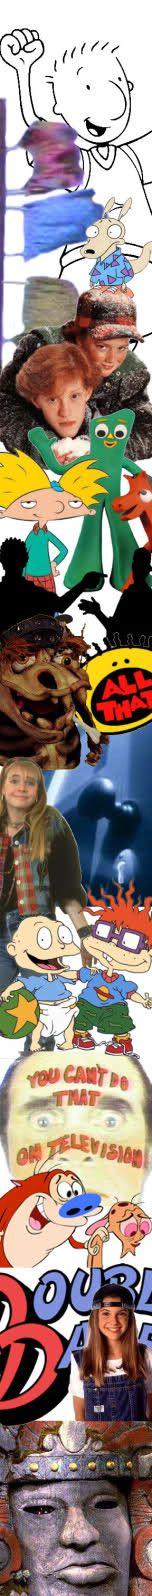 Classic Nickelodeon Shows